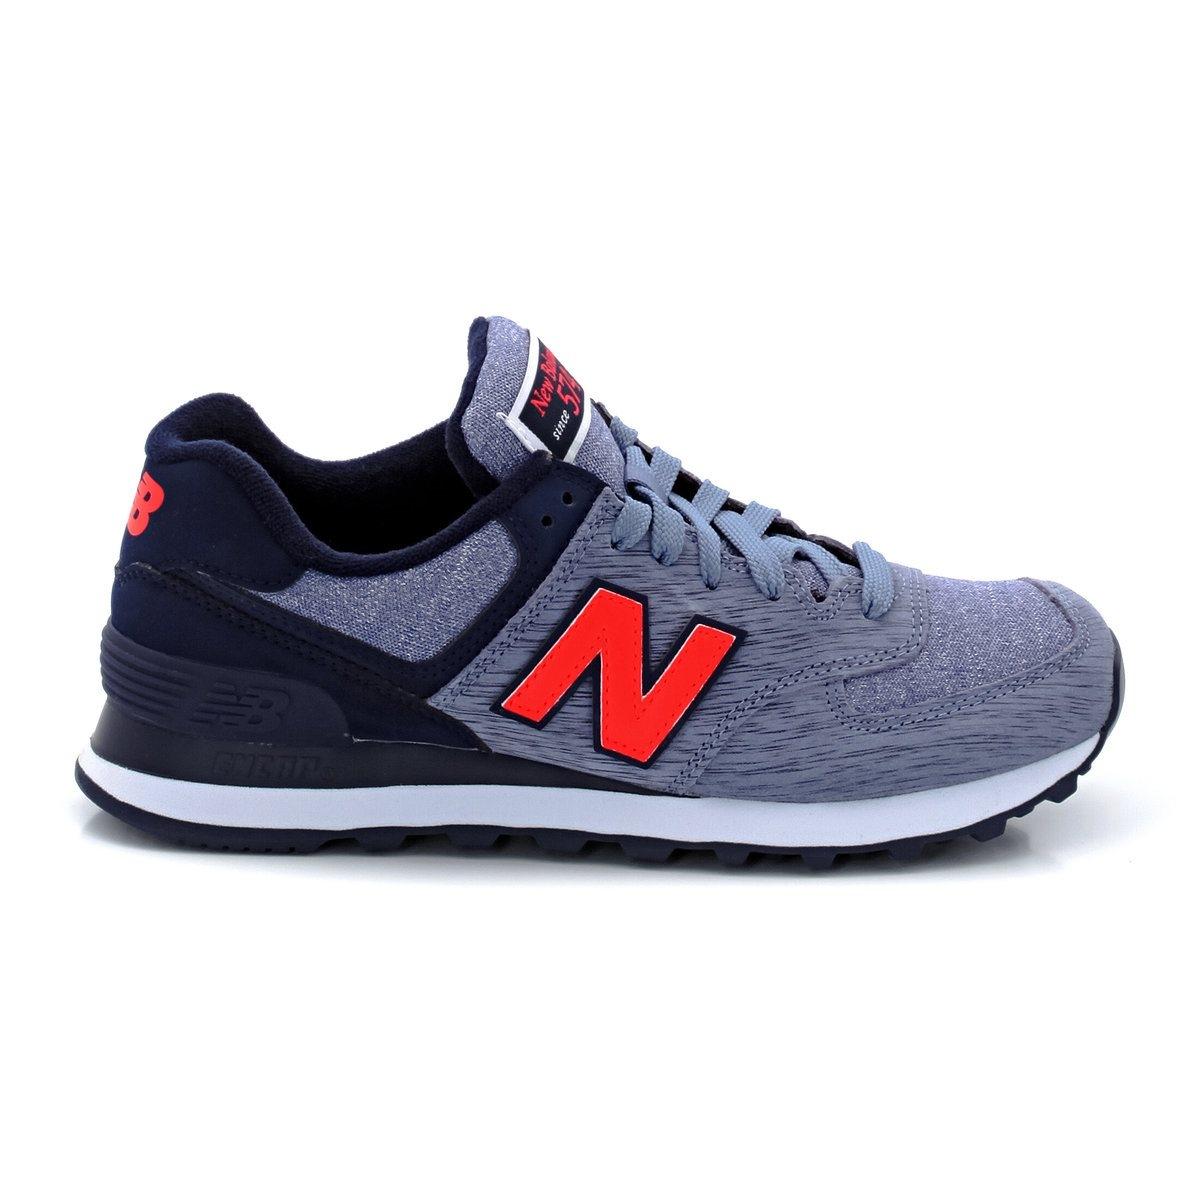 NEW BALANCE WL574WTCНизкие кроссовки NEW BALANCE WL574WTC. Подкладка: текстиль. Стелька: текстиль. Подошва: синтетический материал. Верх: замша + текстиль. Застежка: на шнуровке.<br><br>Цвет: синий/ фиолетовый<br>Размер: 36